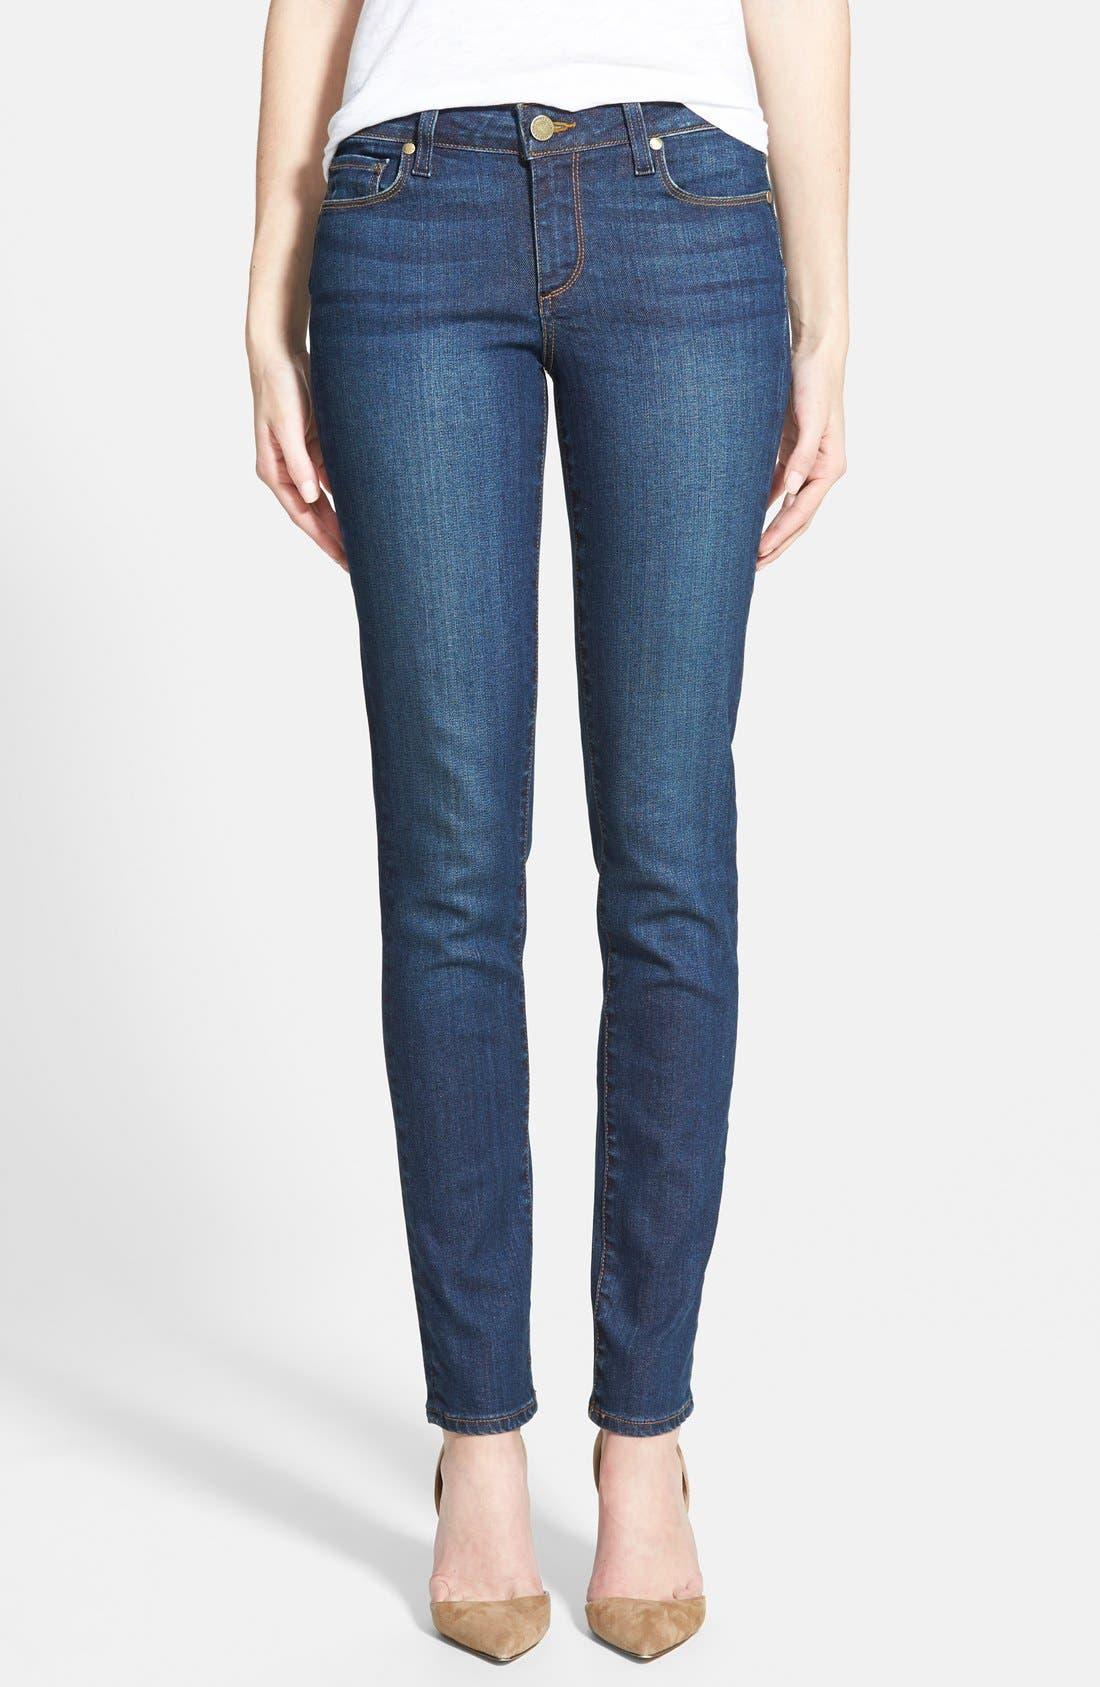 Main Image - Paige Denim 'Skyline' Skinny Jeans (Mischa Blue)